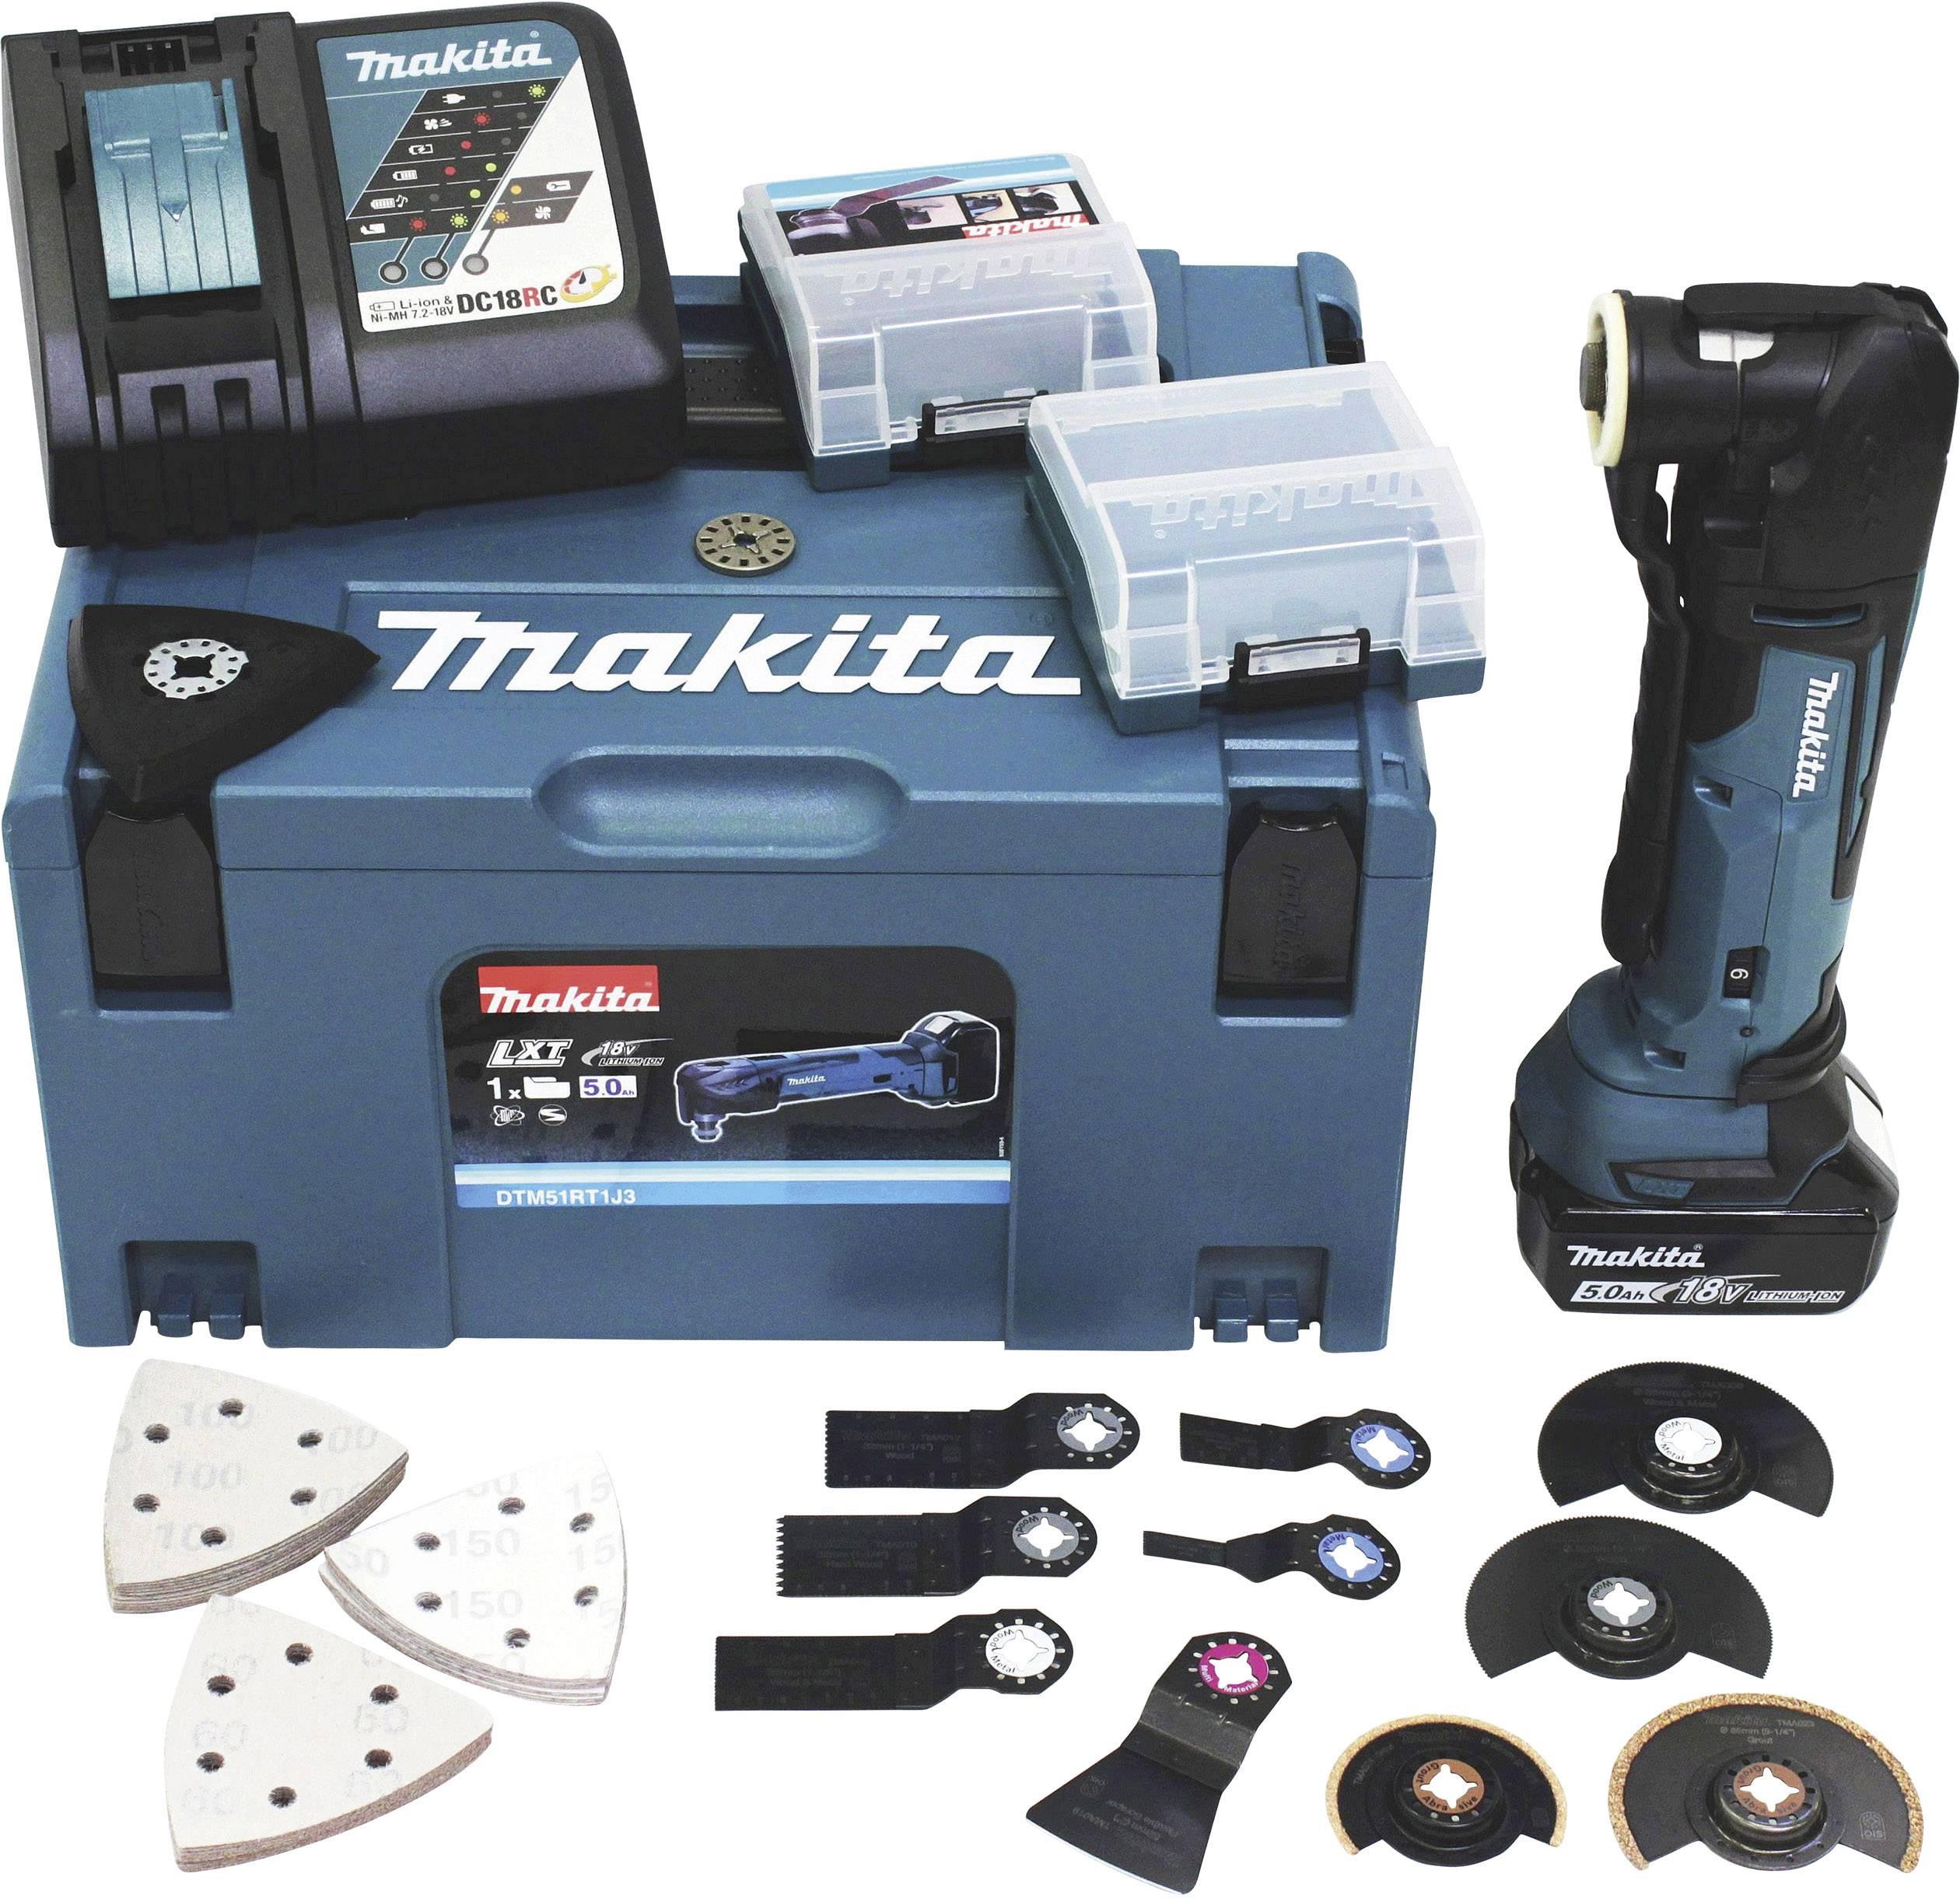 Makita Multifunktionswerkzeug DTM51Z 18V DTM51 ohne Akku und Ladegerät Multitool